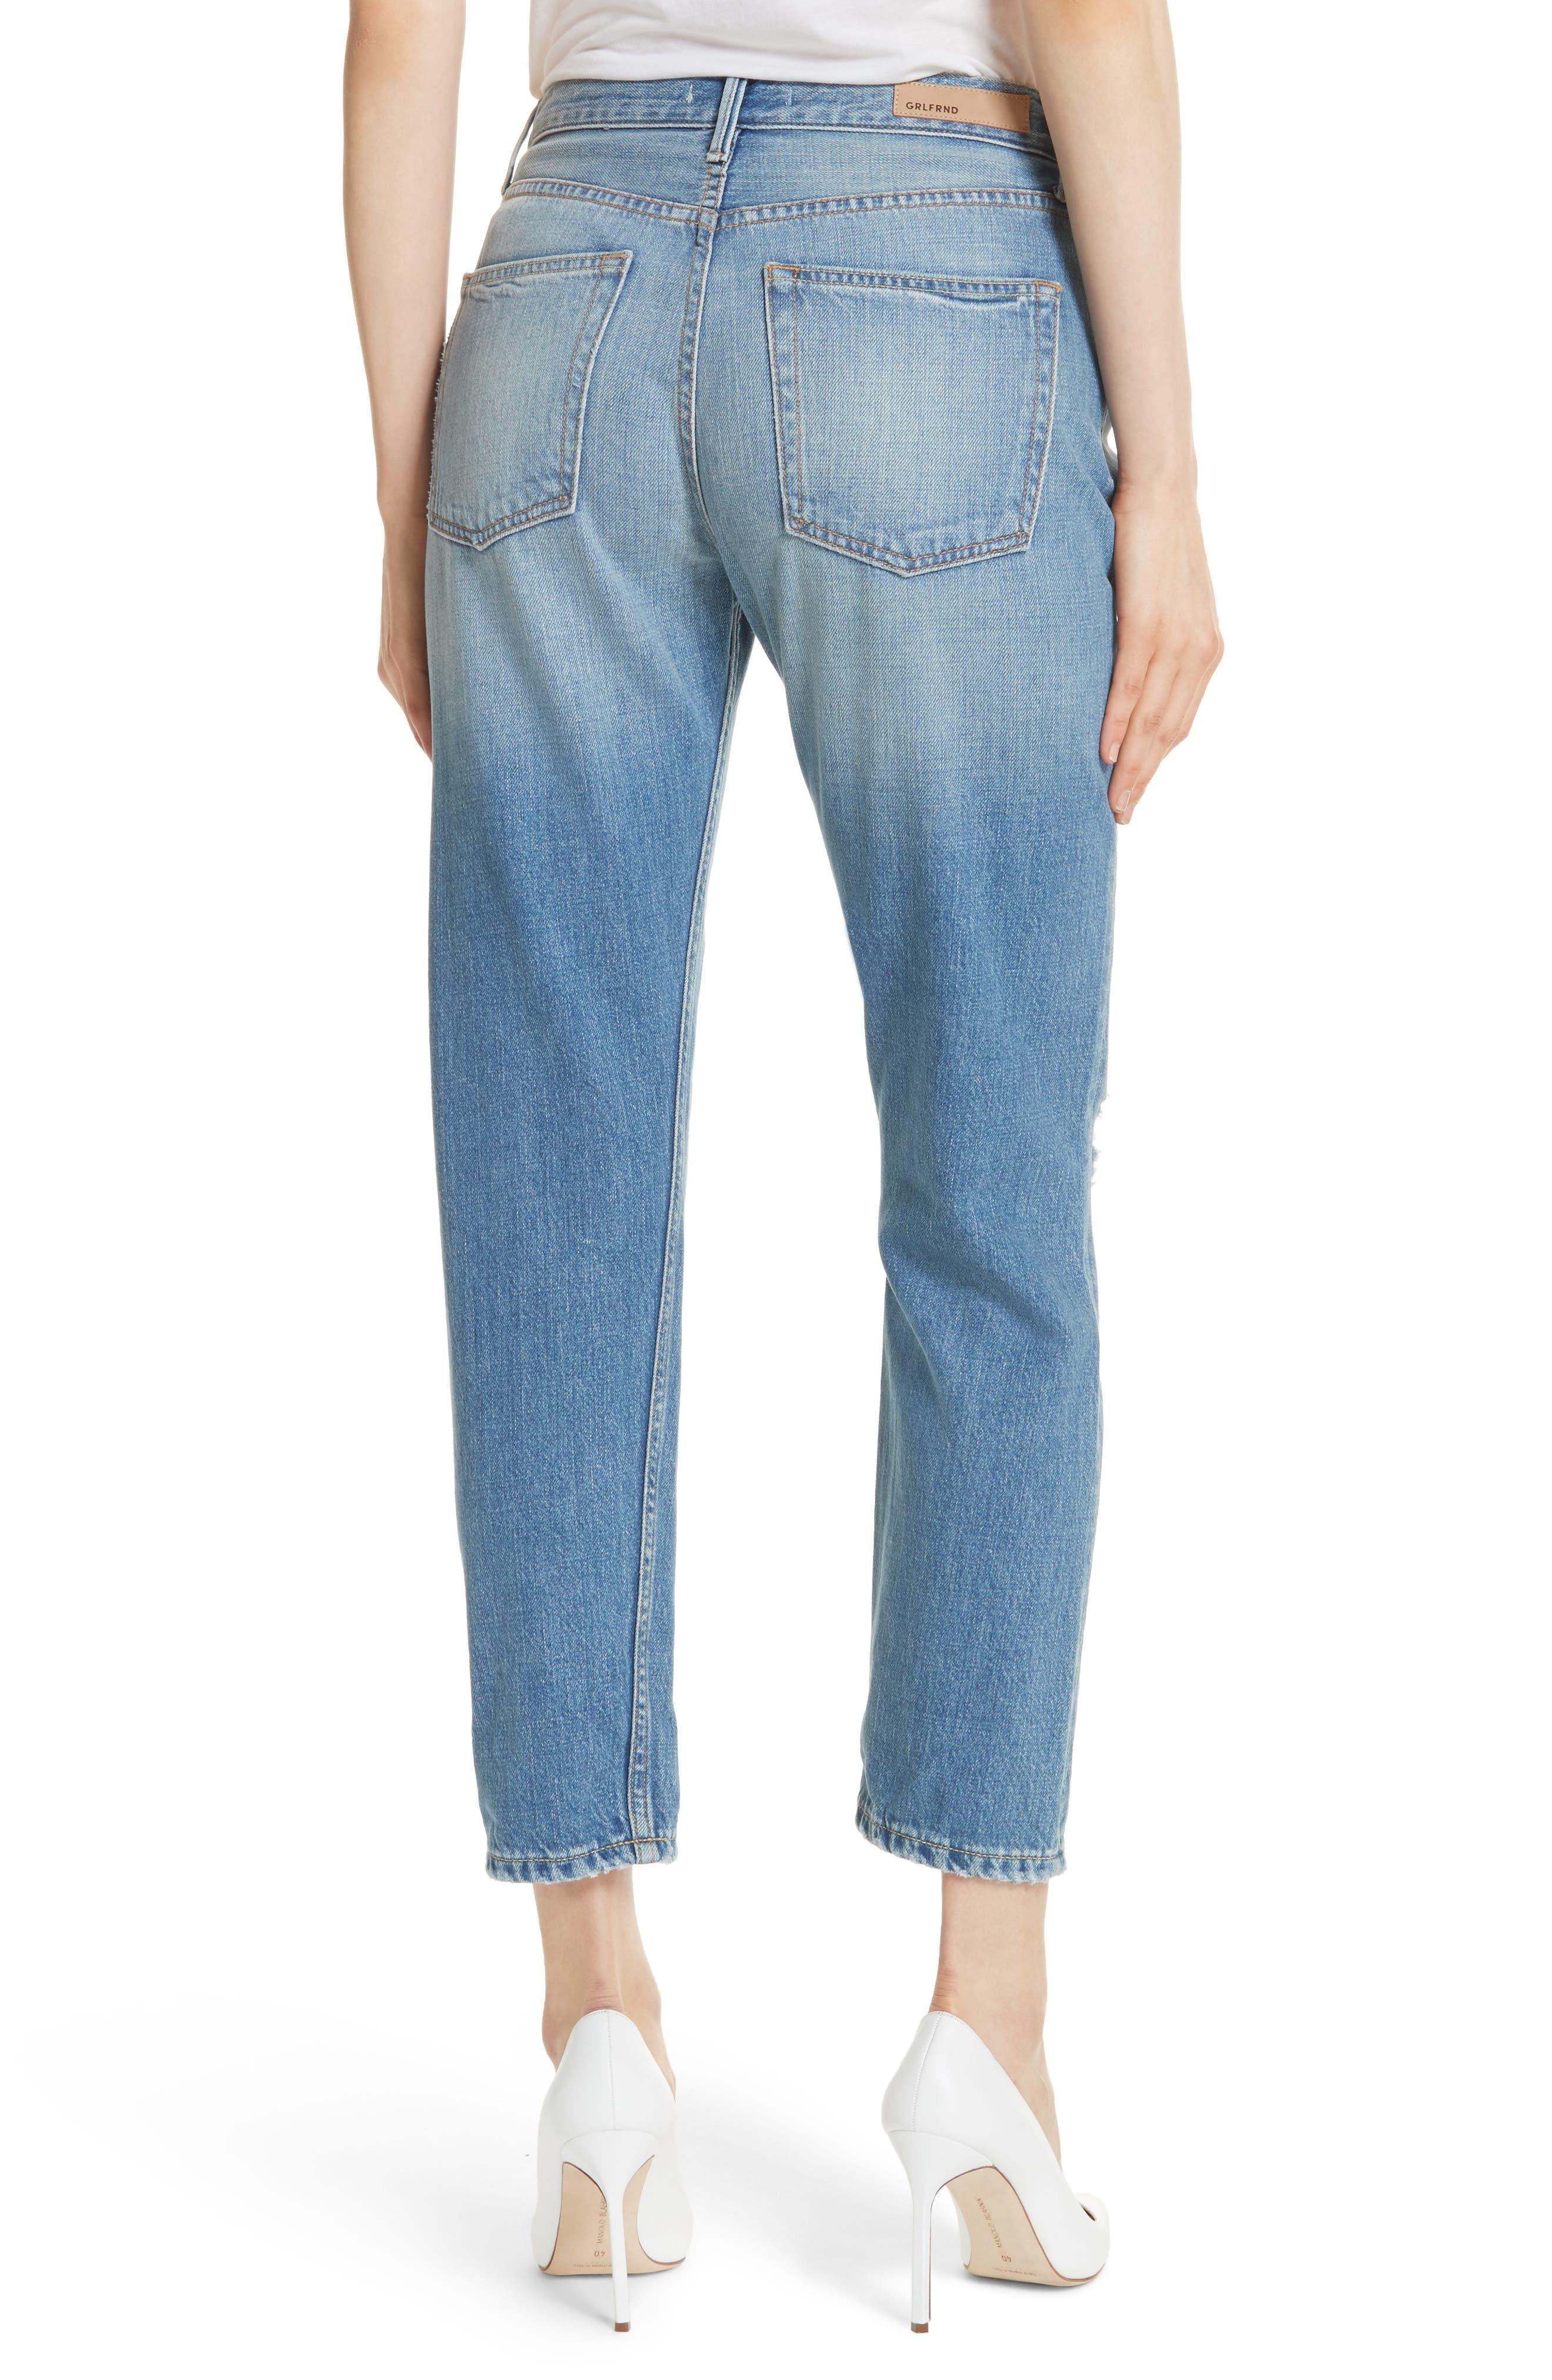 Kiara High Waist Ankle Boyfriend Jeans,                             Alternate thumbnail 2, color,                             464